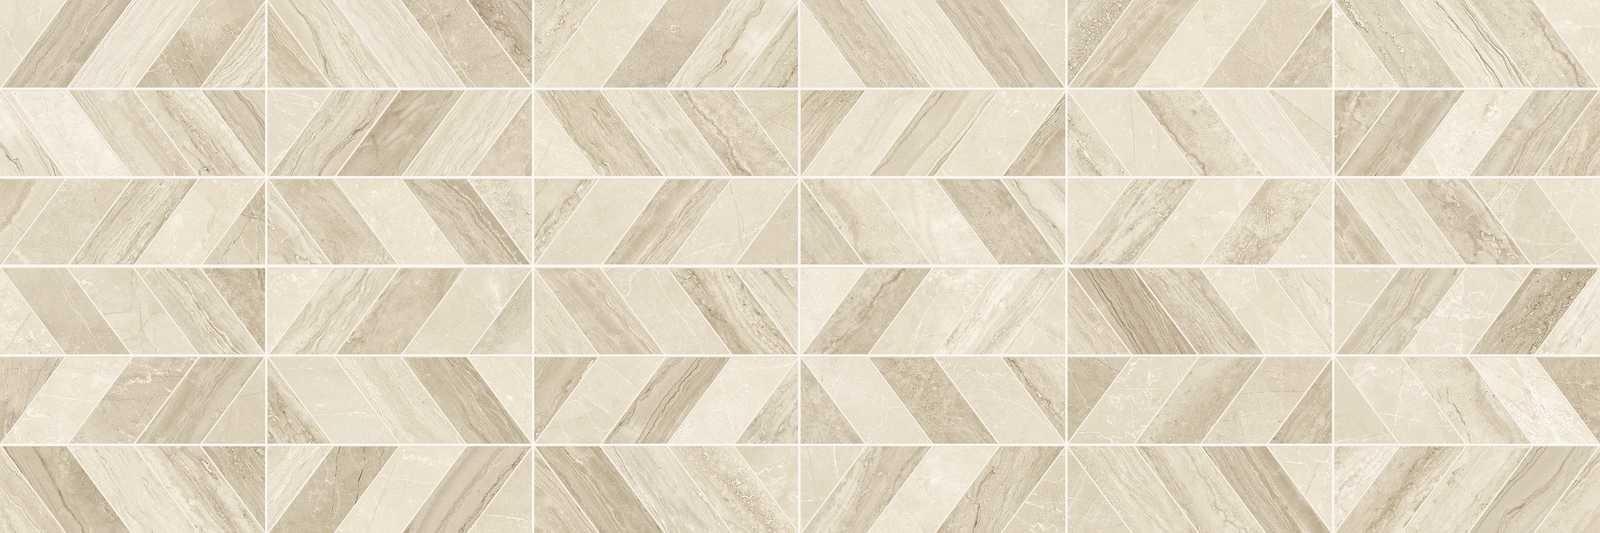 Декор Marbleplay Decoro Naos Travertino/Marfil 30x90